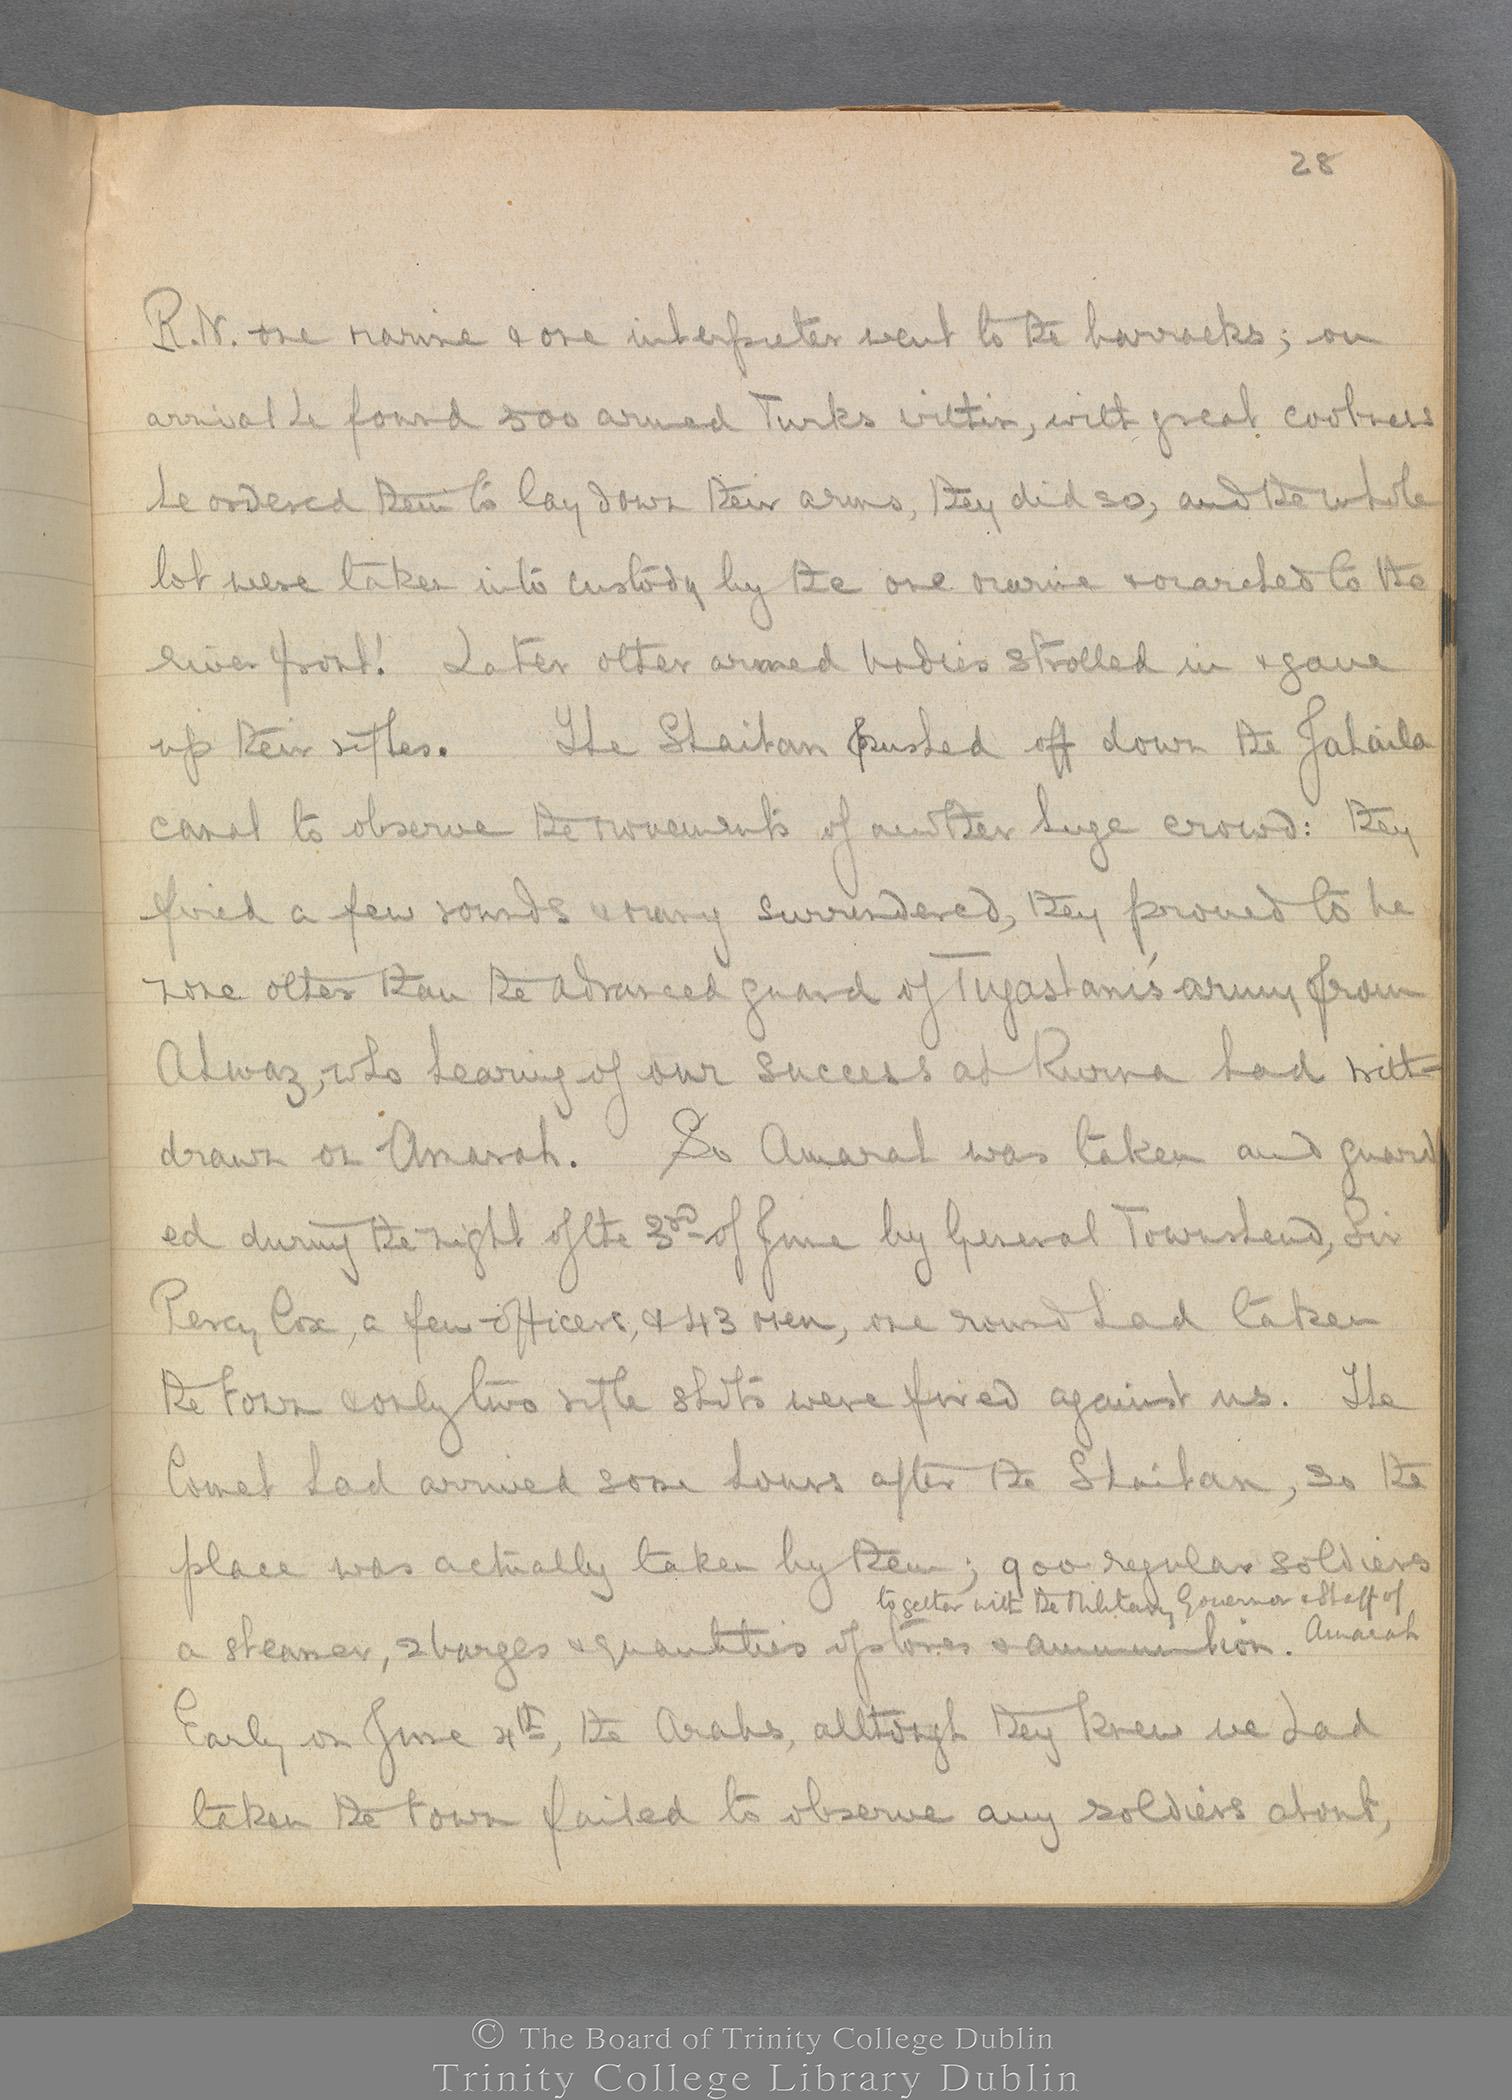 TCD MS 3414 folio 28 recto